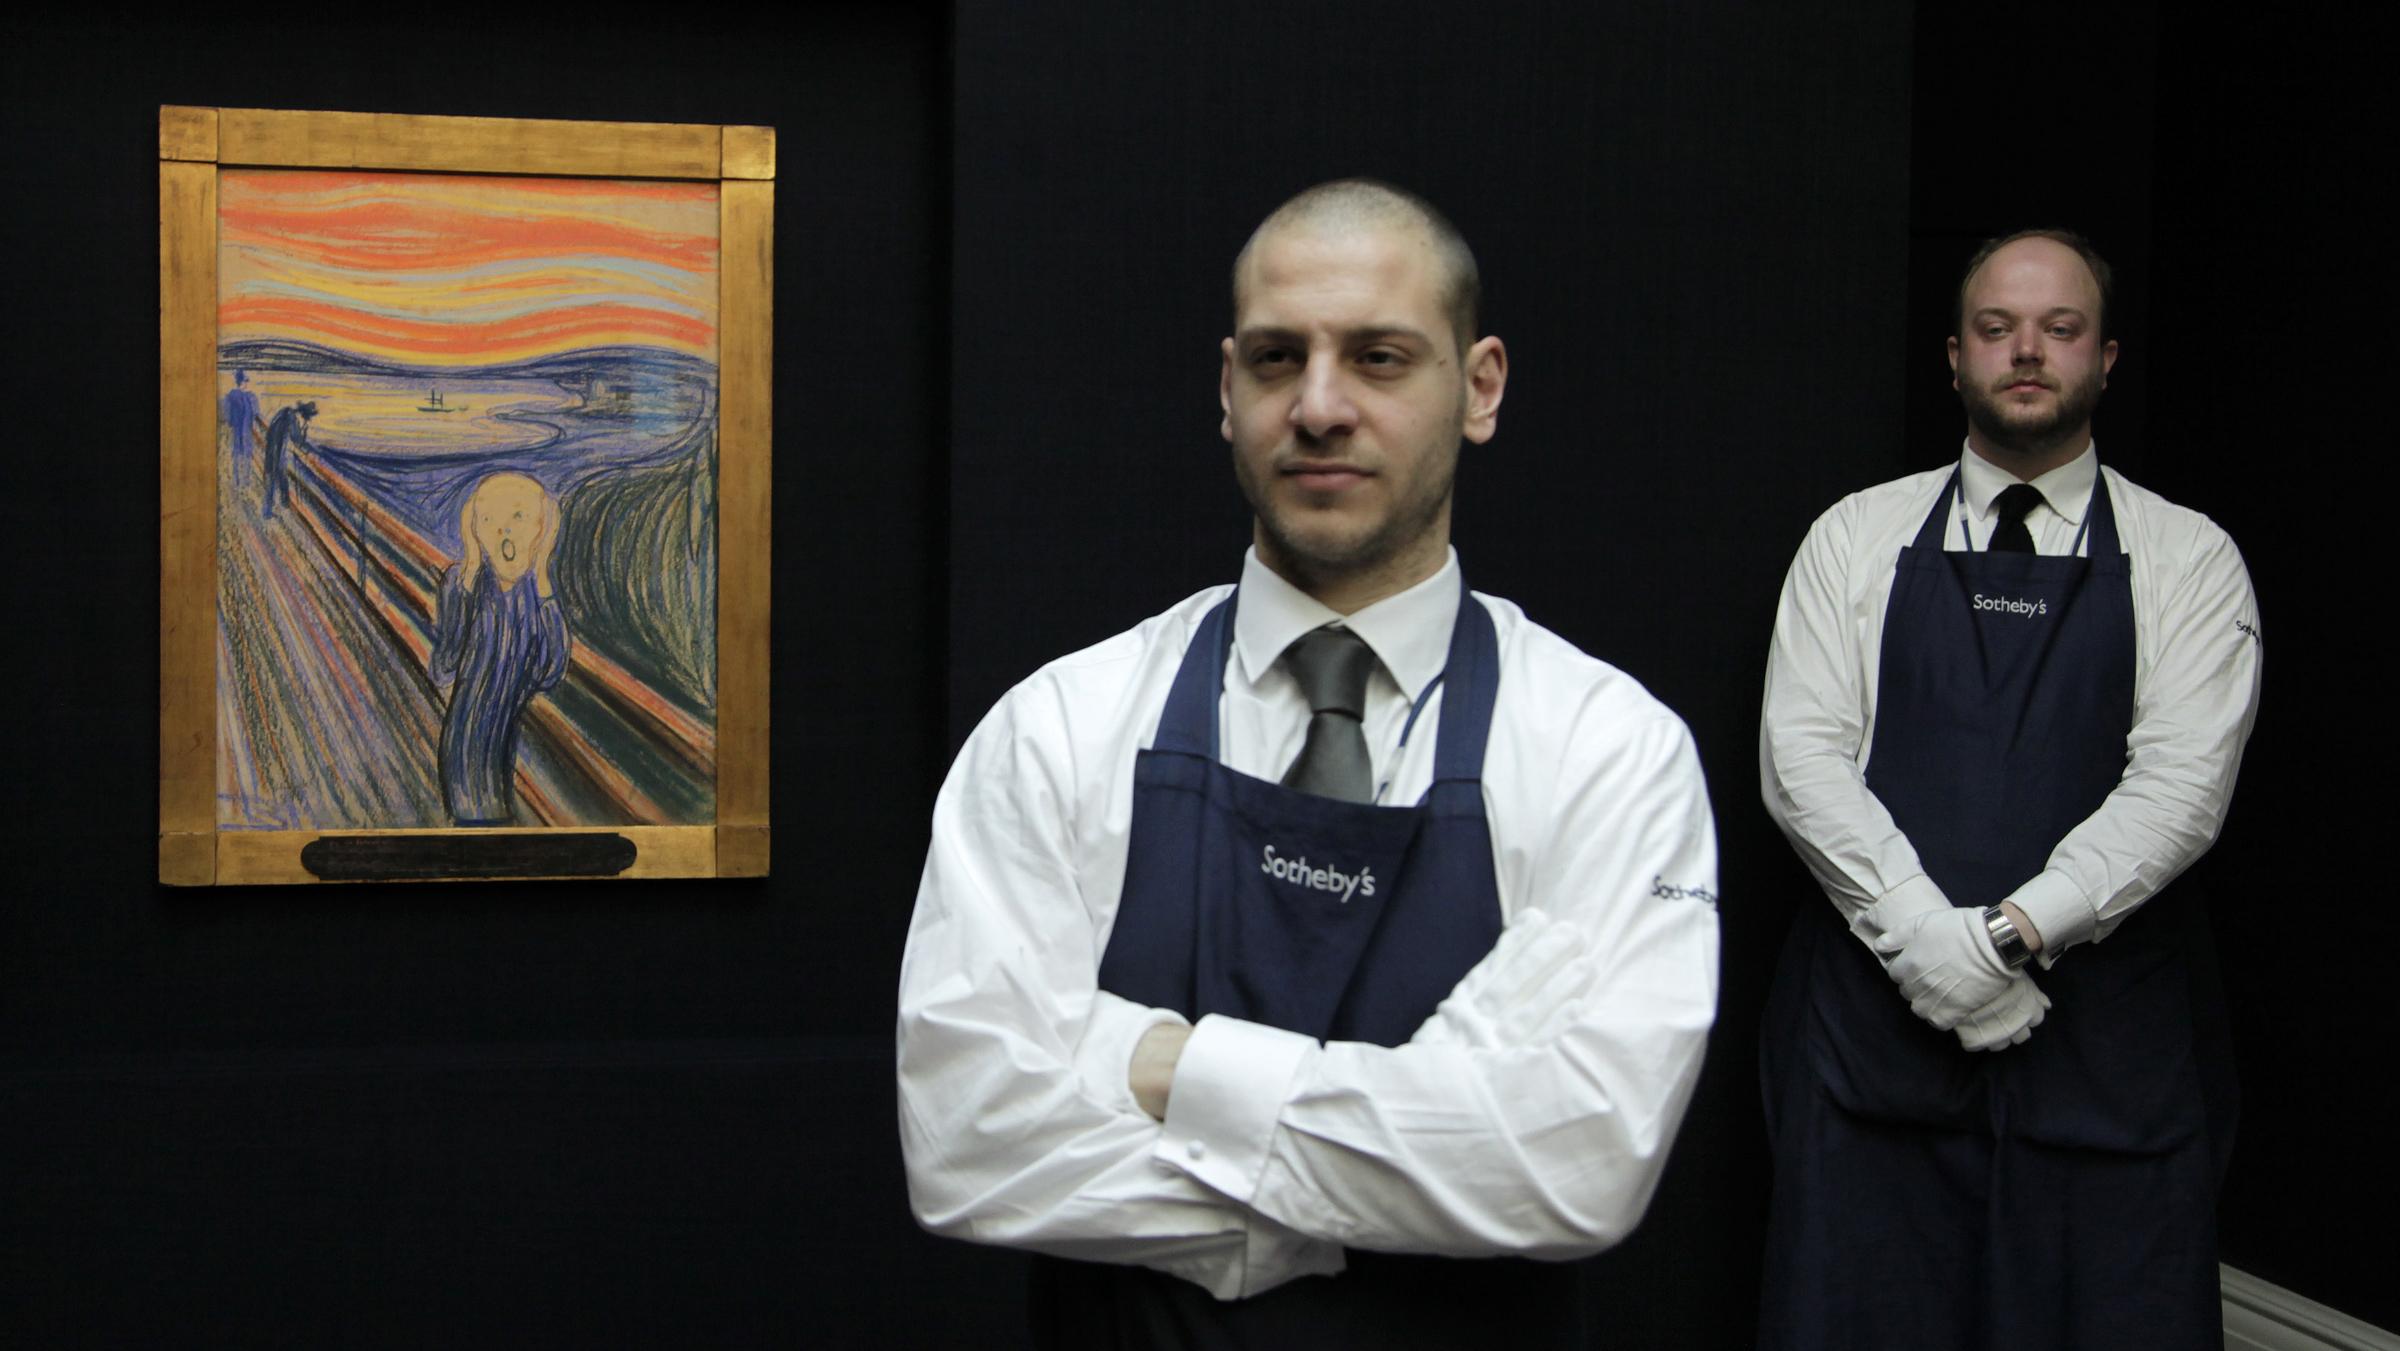 sotheby's employees art